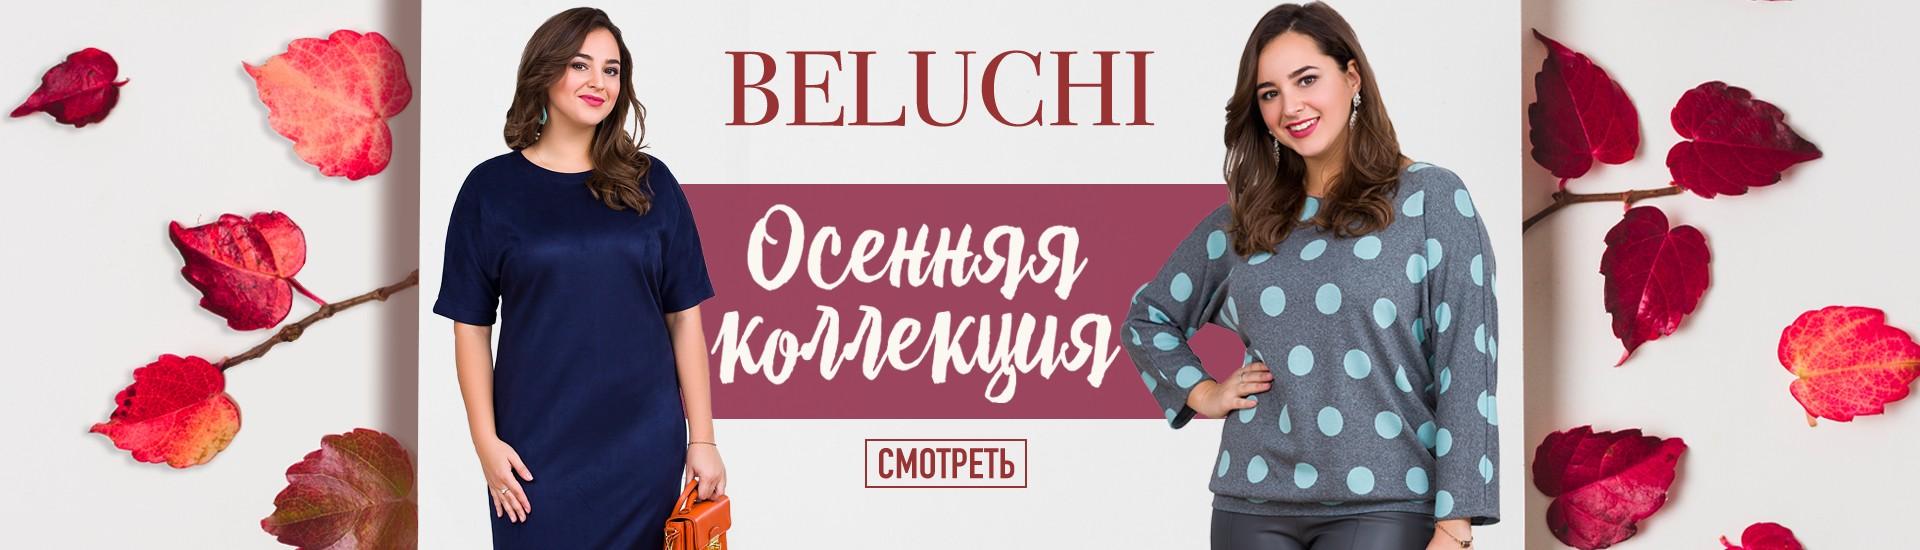 BELUCHI